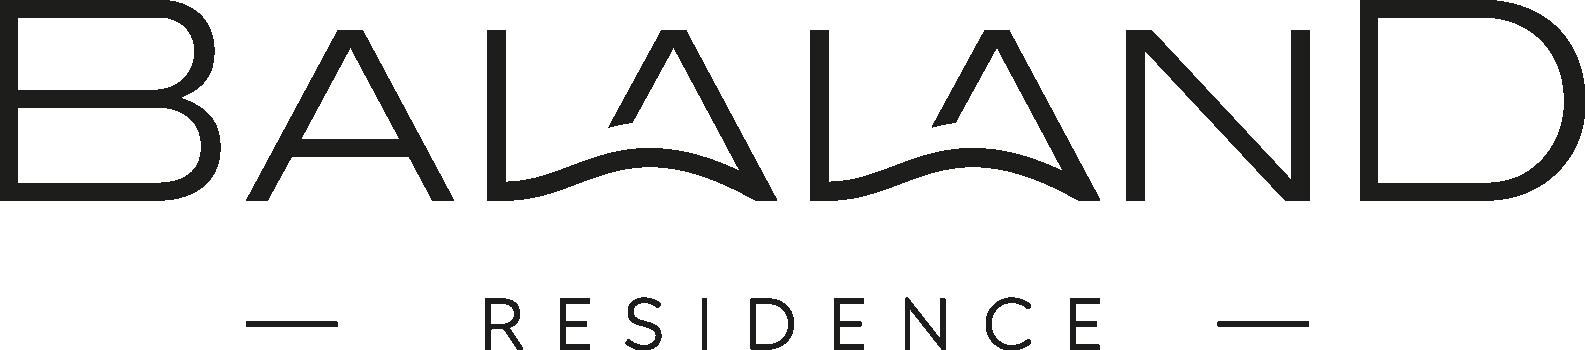 BalaLand Residence Kft.